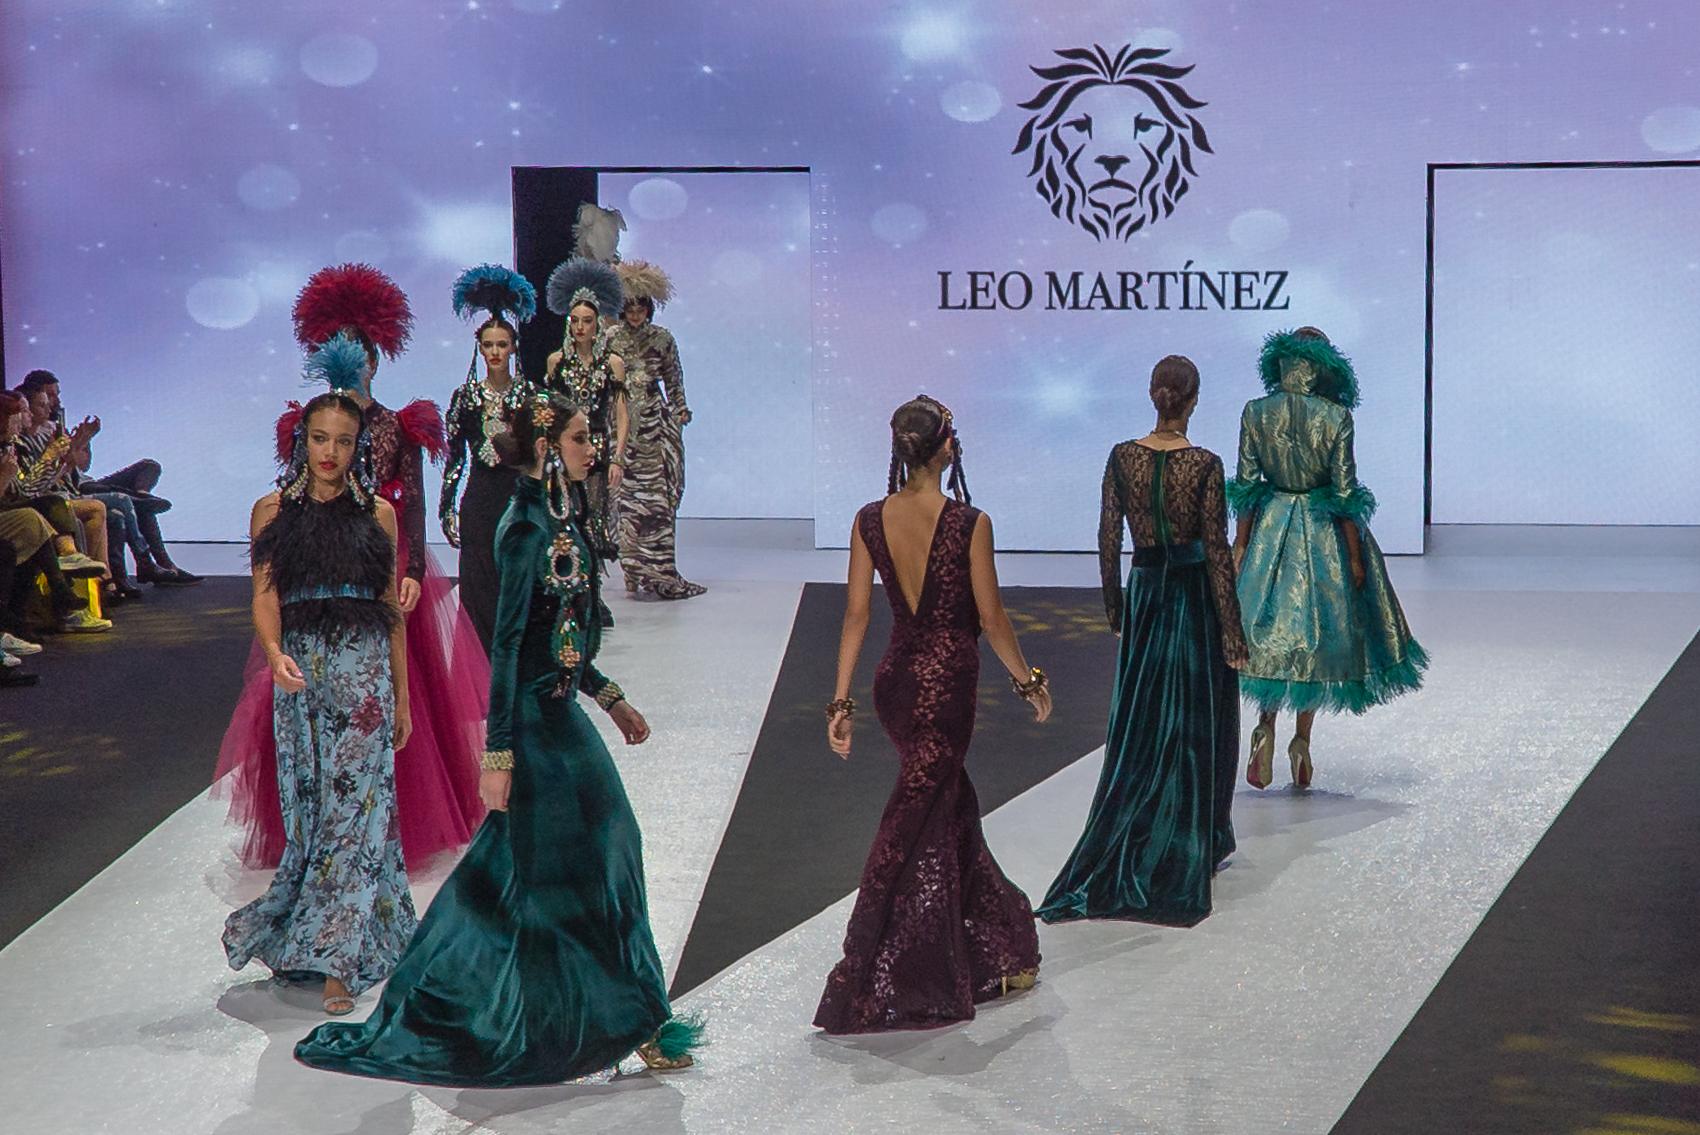 La Caja Negra de la Feria de la Moda de Tenerife se cubre de glamour